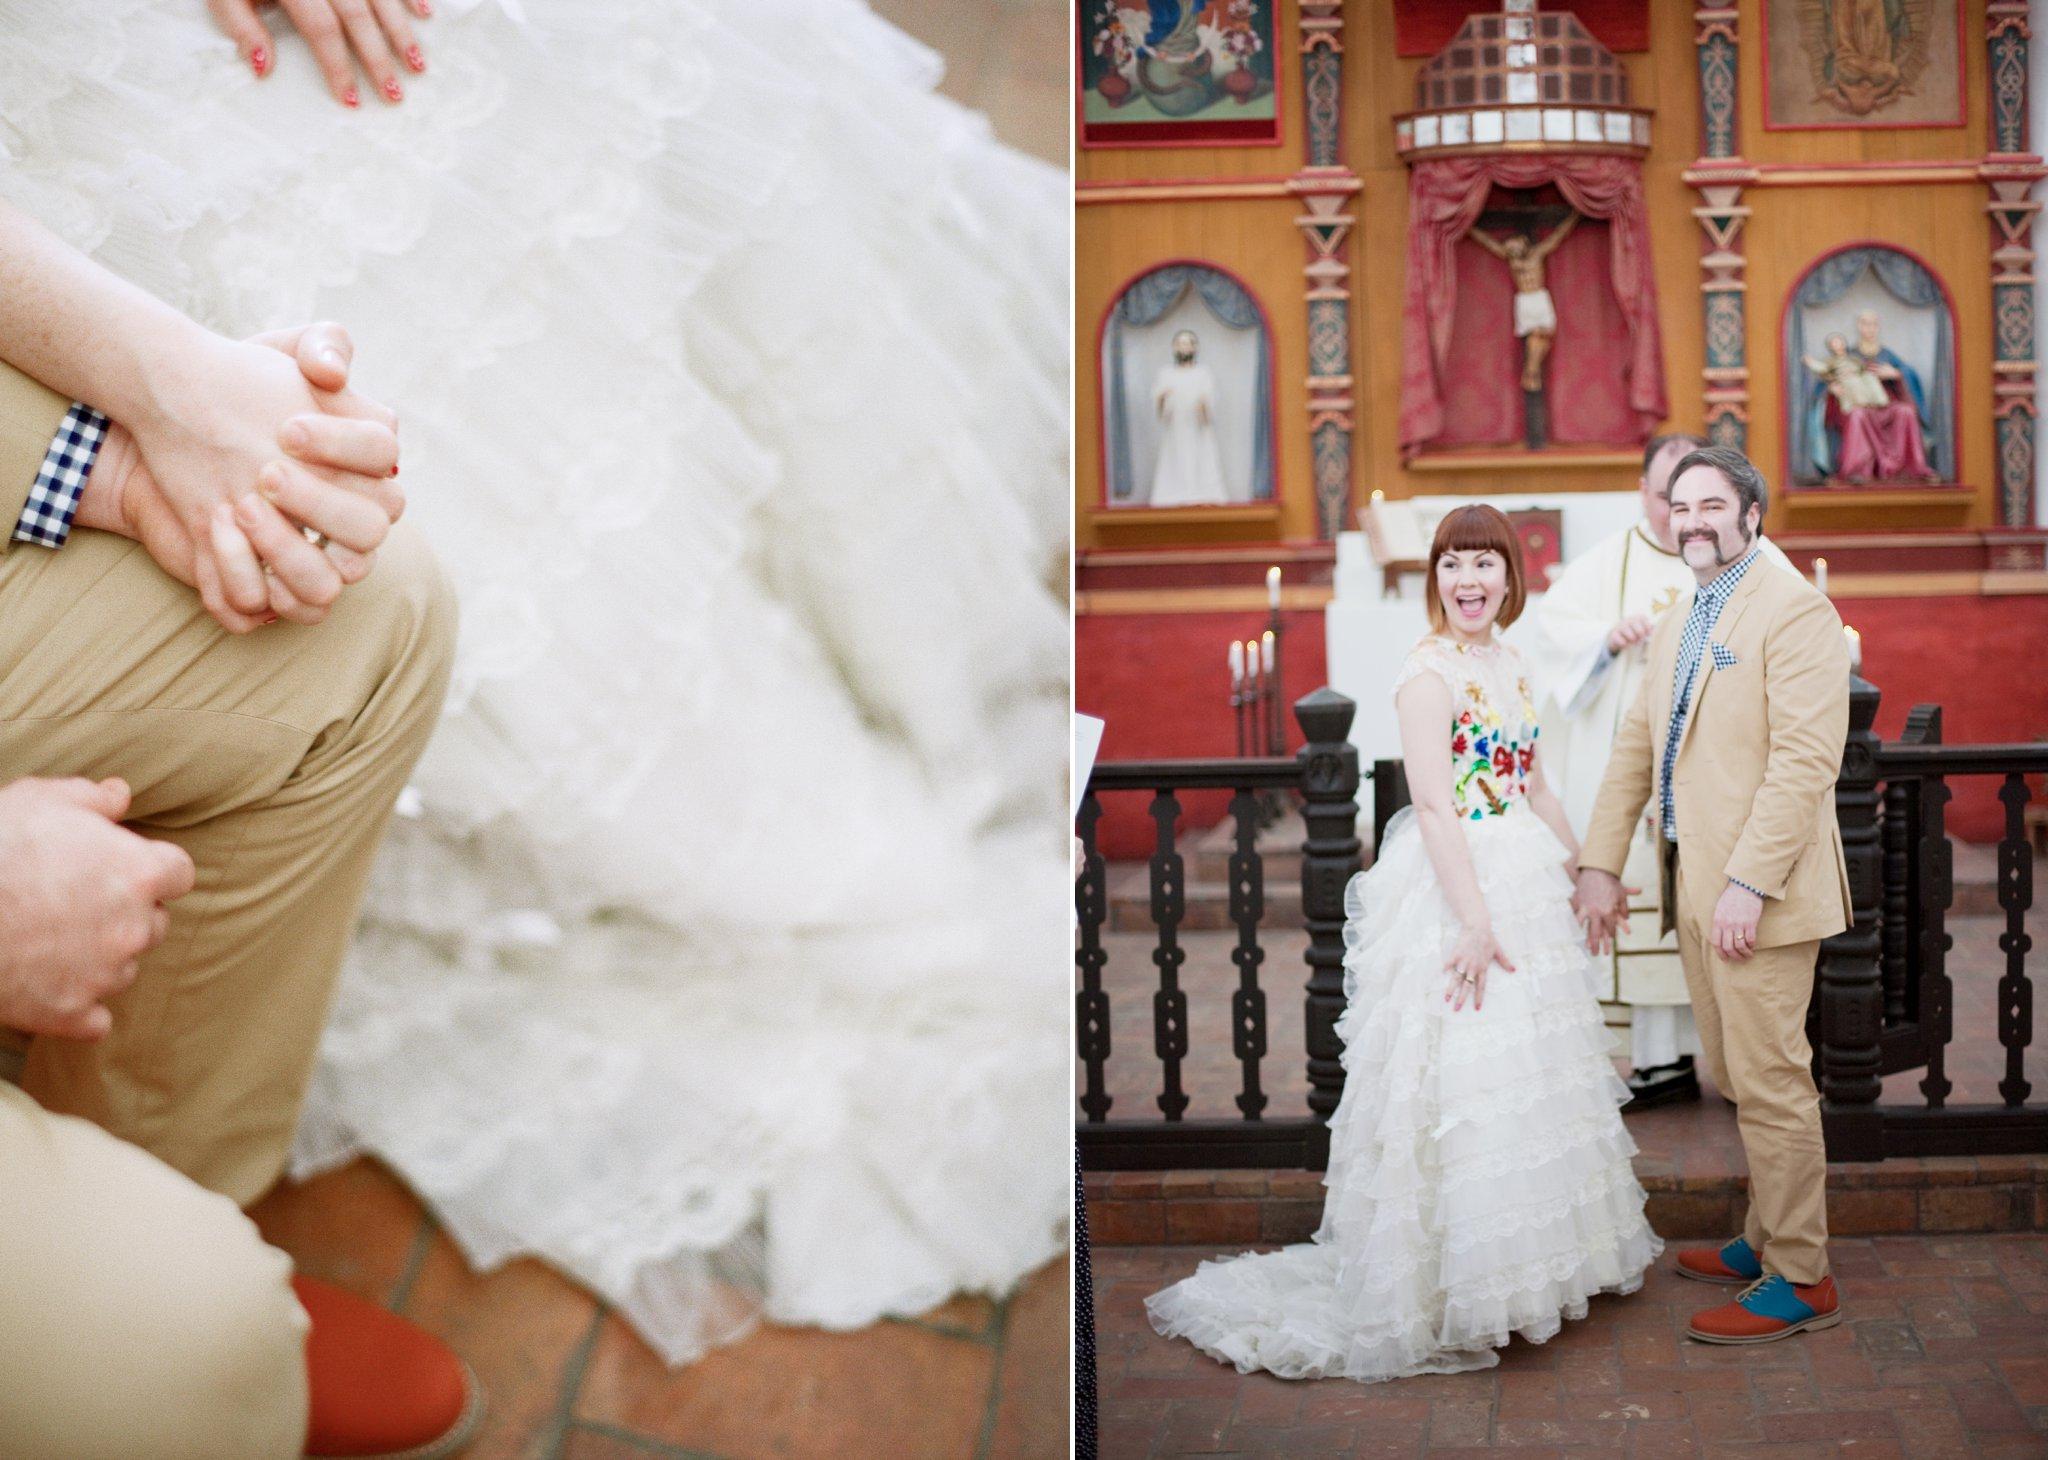 eclectic texan wedding the connoisseur of cute wedding texas wedding photographer shannon griffin photography_0019.jpg